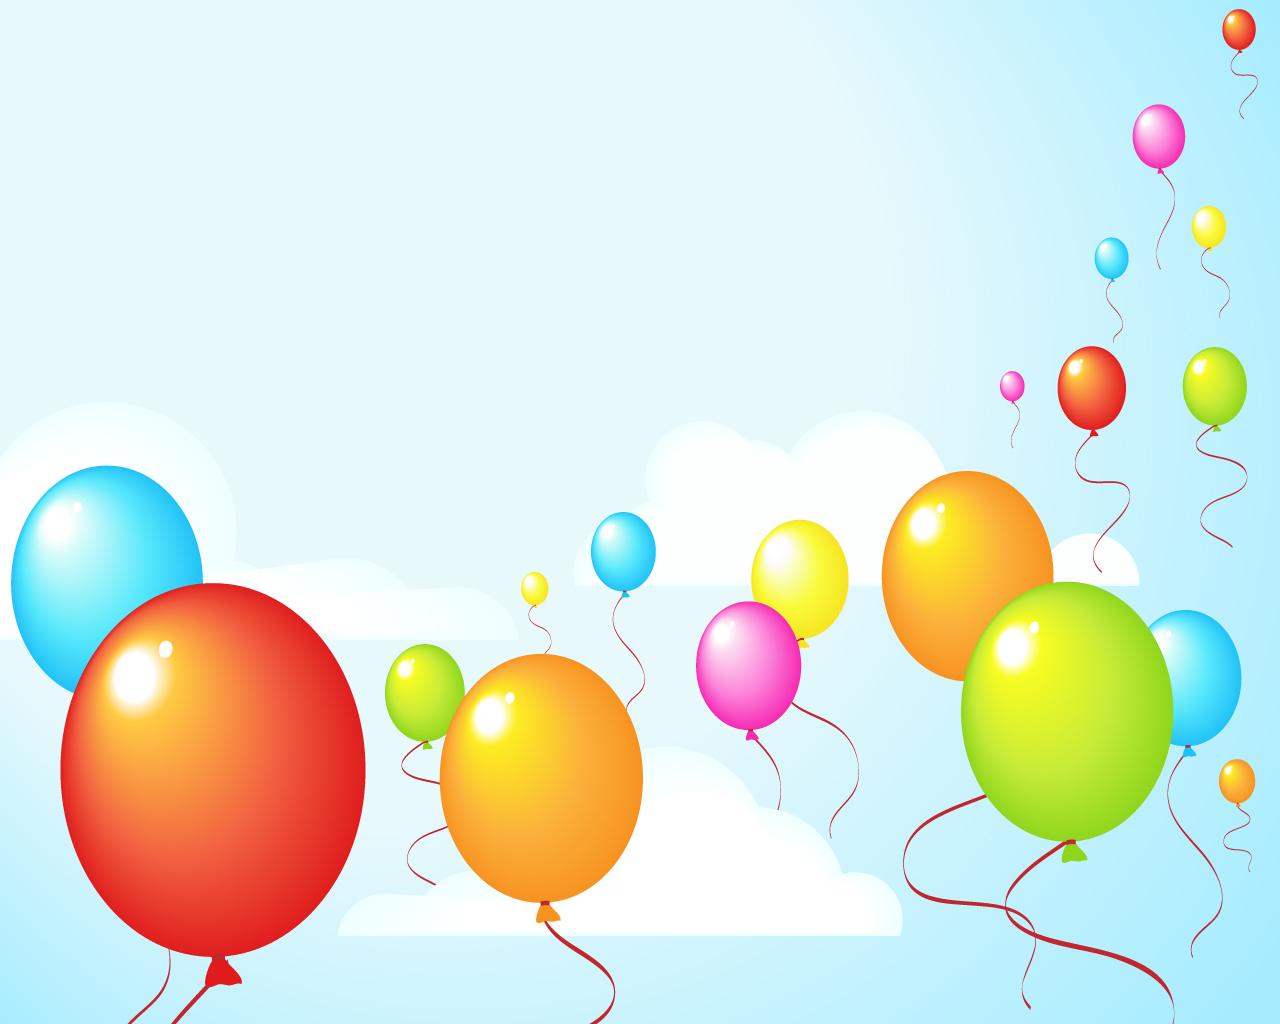 party balloons wallpaper   ForWallpapercom 1280x1024